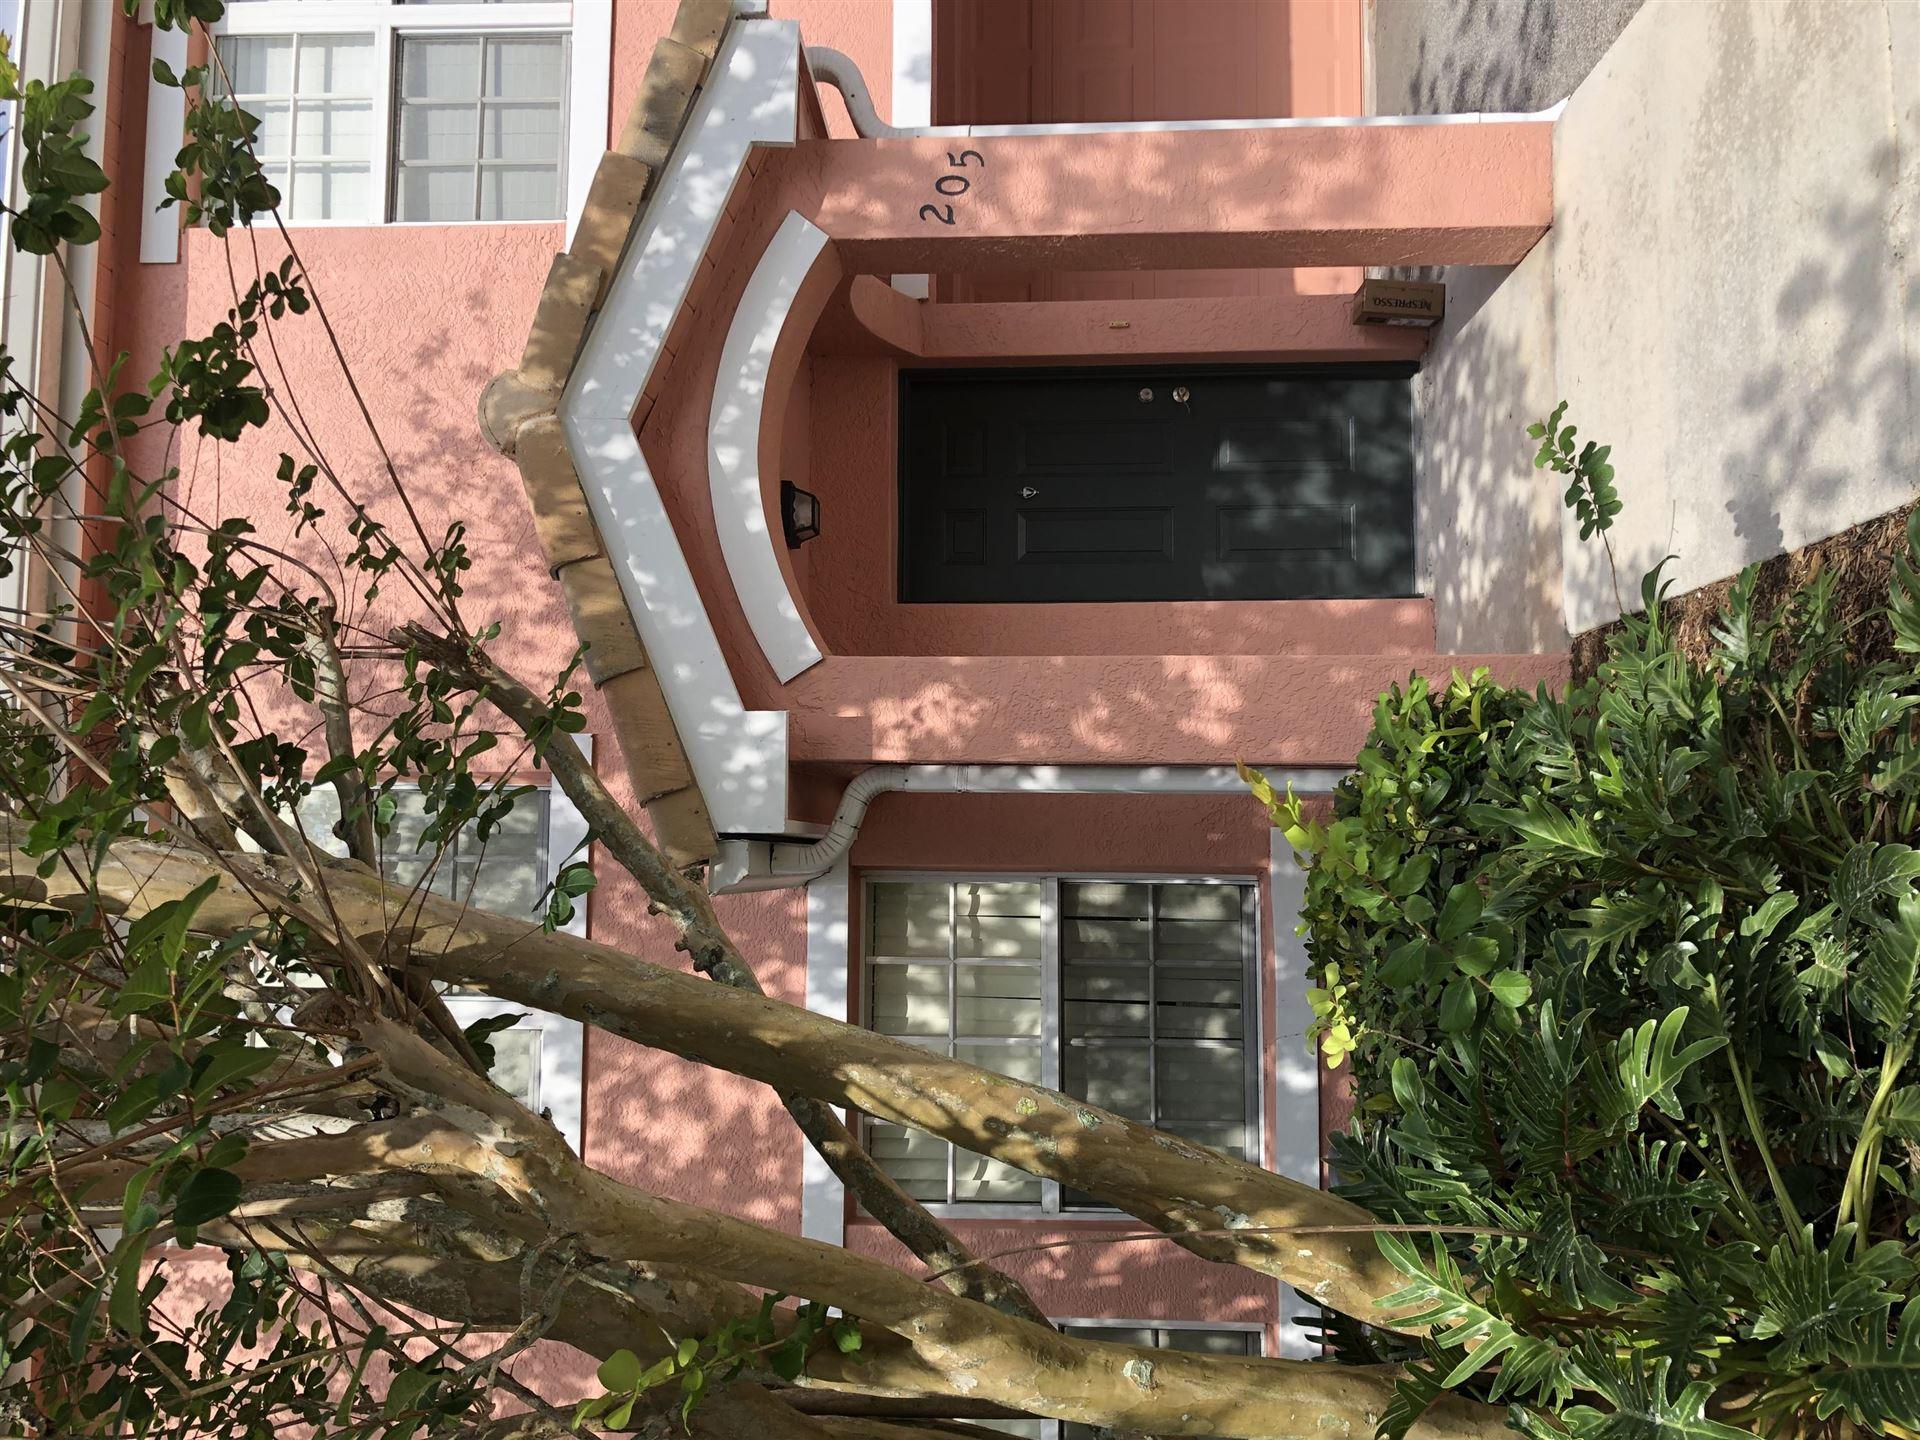 144 SW Peacock Boulevard SW #23205, Port Saint Lucie, FL 34986 - MLS#: RX-10714753